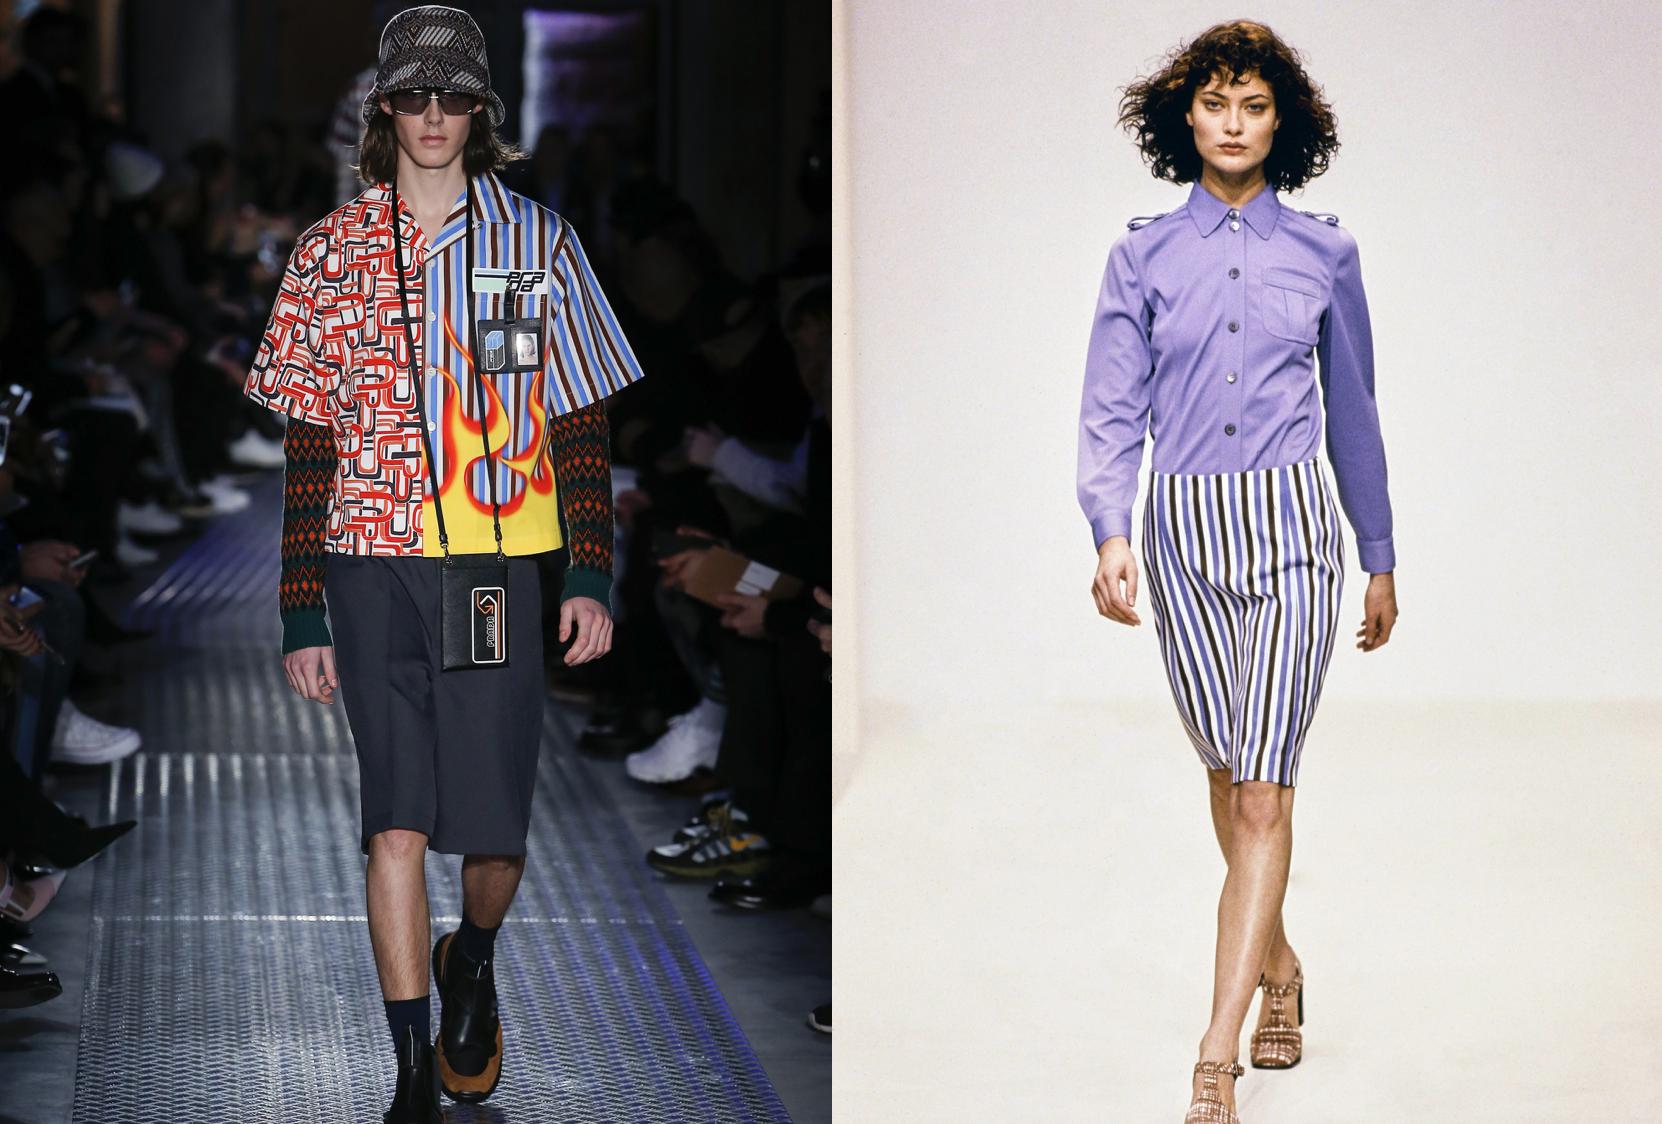 Prada F/W 2018 stripes (left) & Prada S/S 1996 (right)